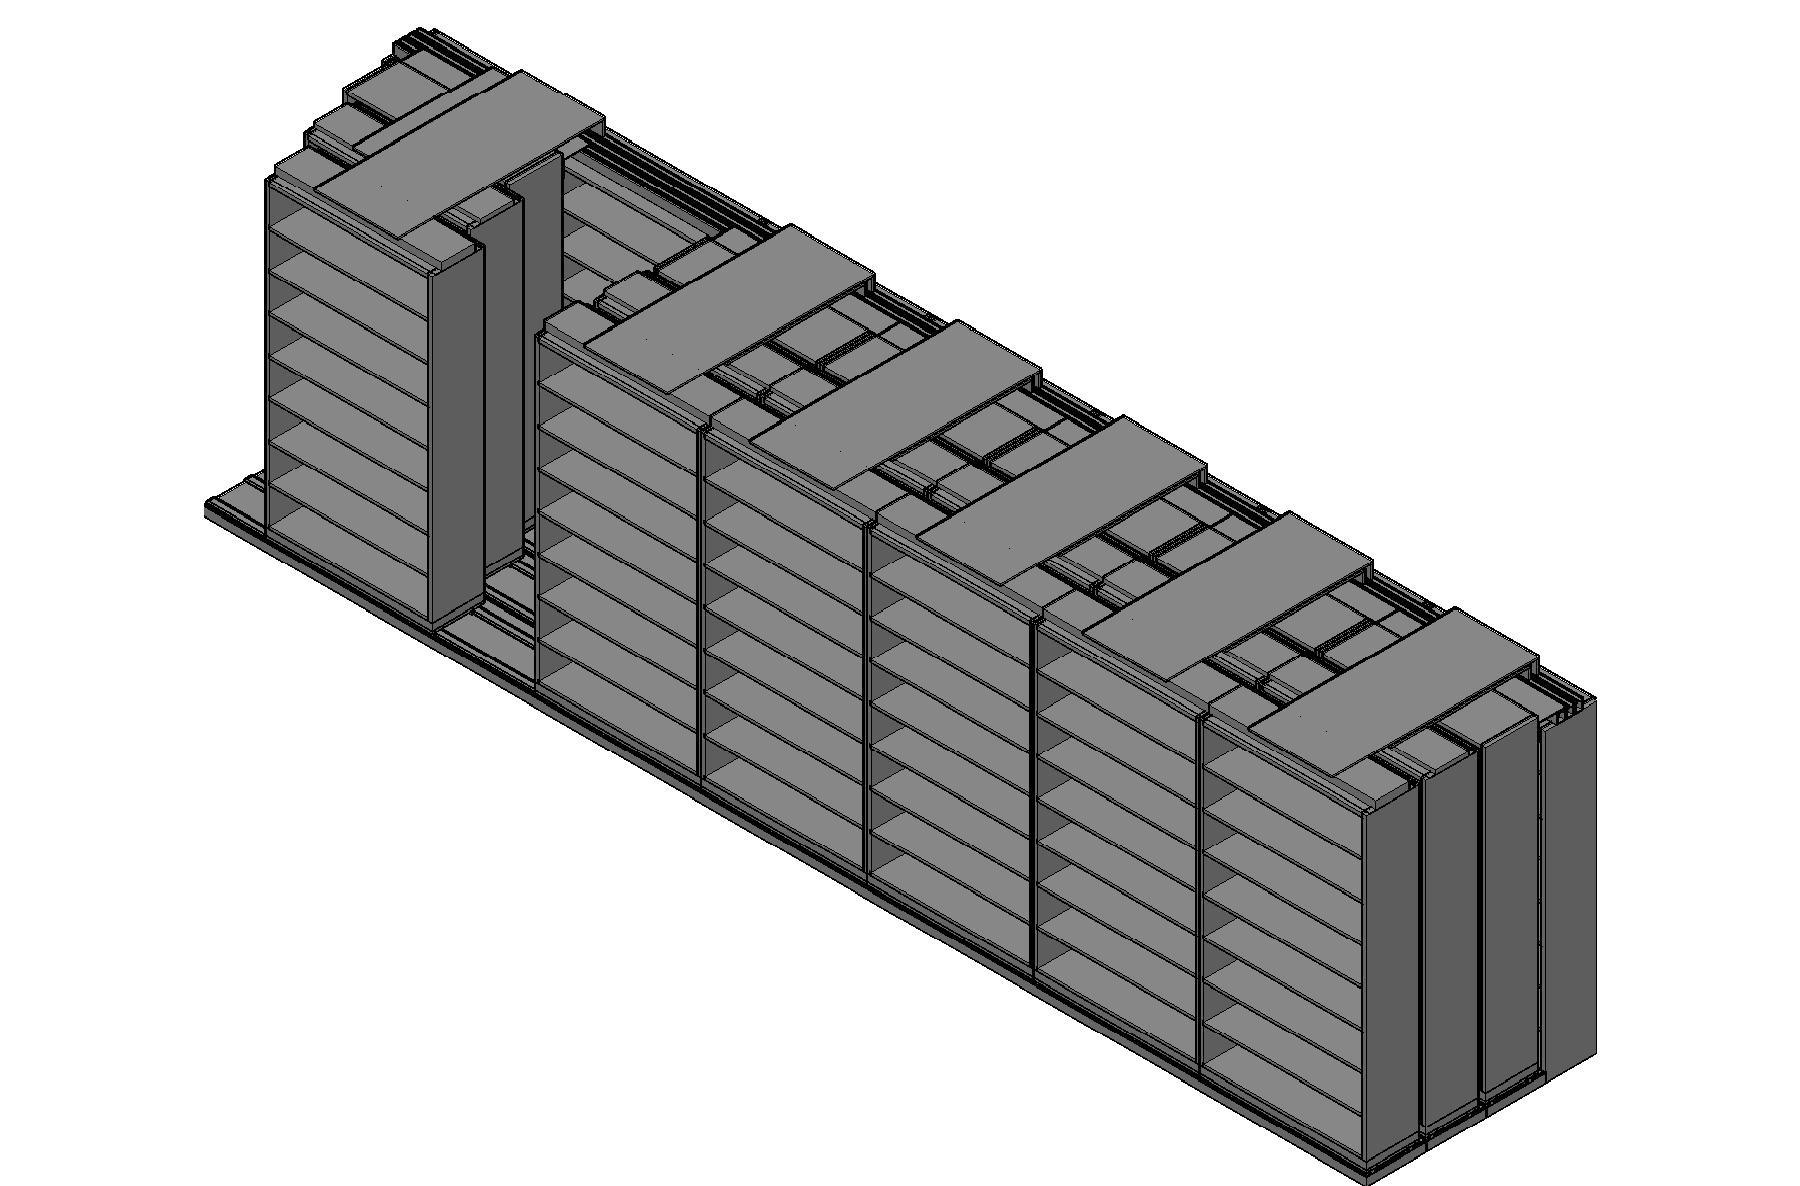 "Legal Size Sliding Shelves - 4 Rows Deep - 8 Levels - (48"" x 15"" Shelves) - 340"" Total Width"